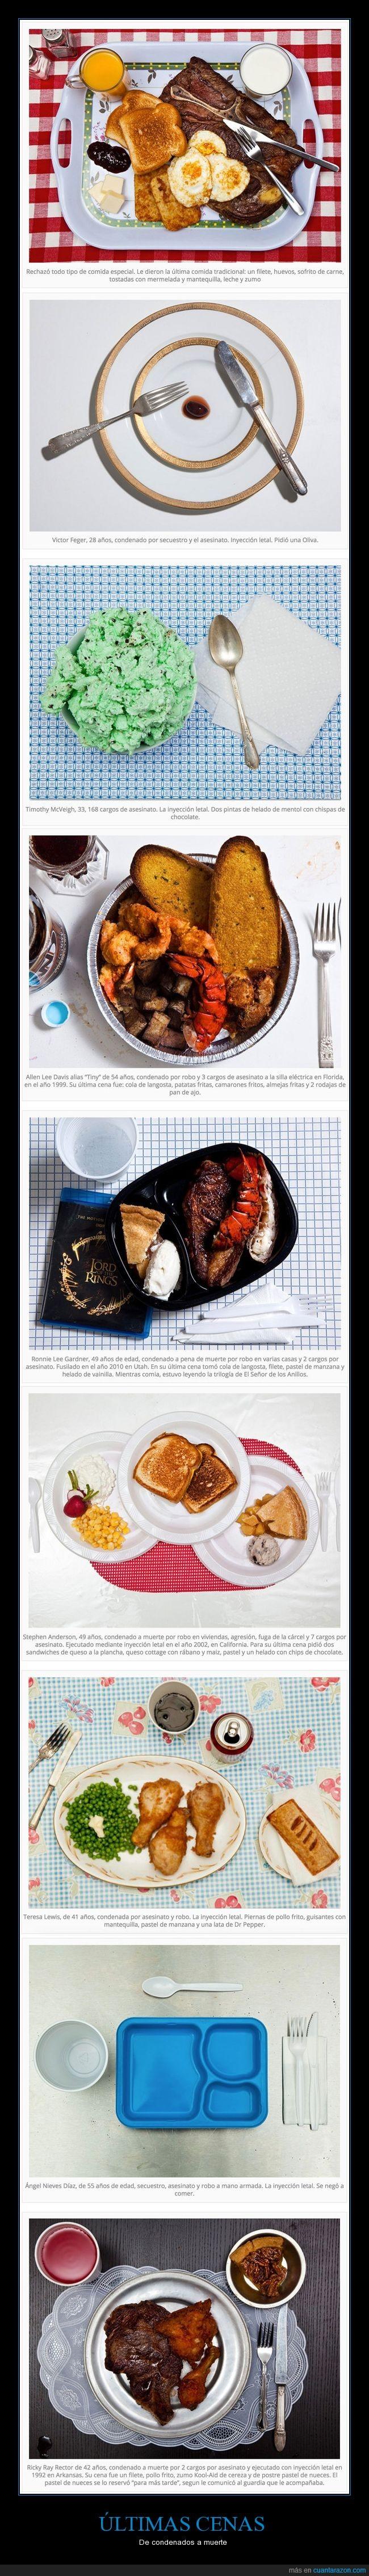 cárcel,cena,comida,pena de muerte,presos,última cena